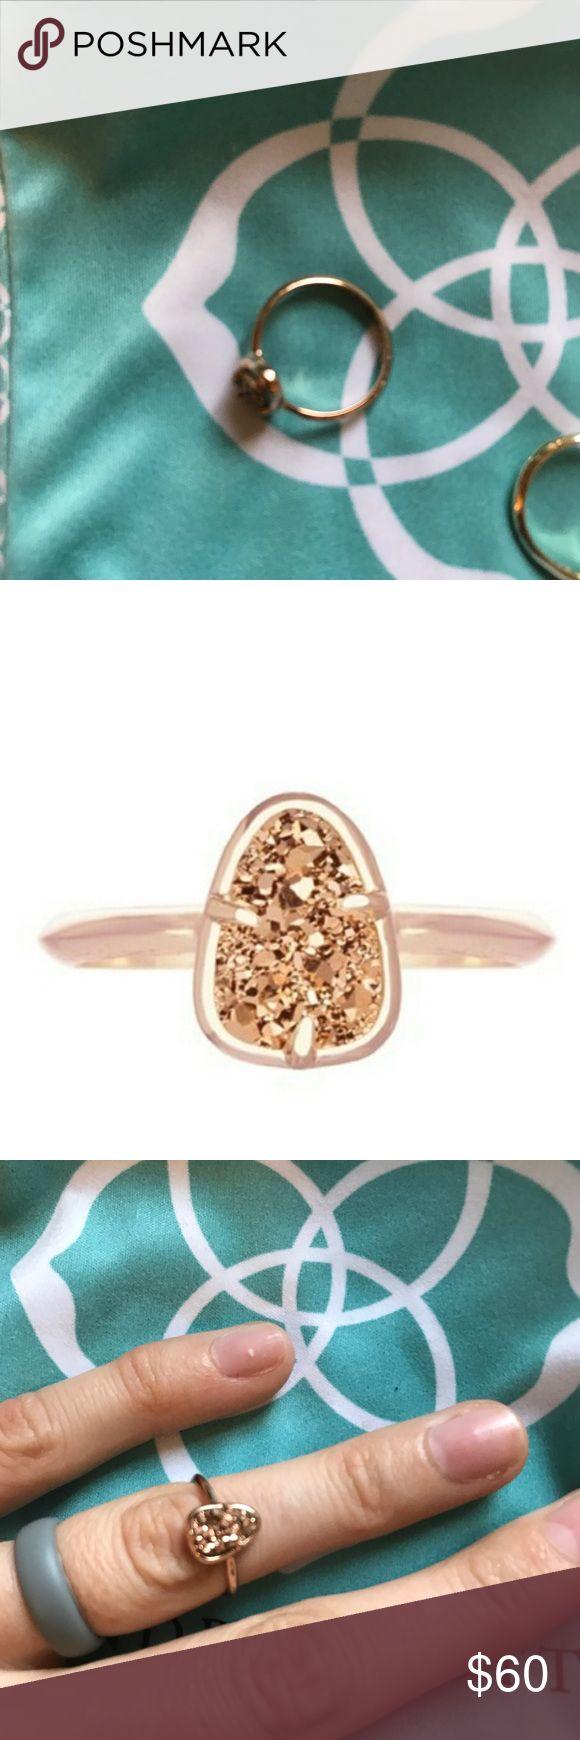 Kendra Scott Haylee Rose Gold Druzy Ring Like new. Includes dust bag. Kendra Scott Jewelry Rings